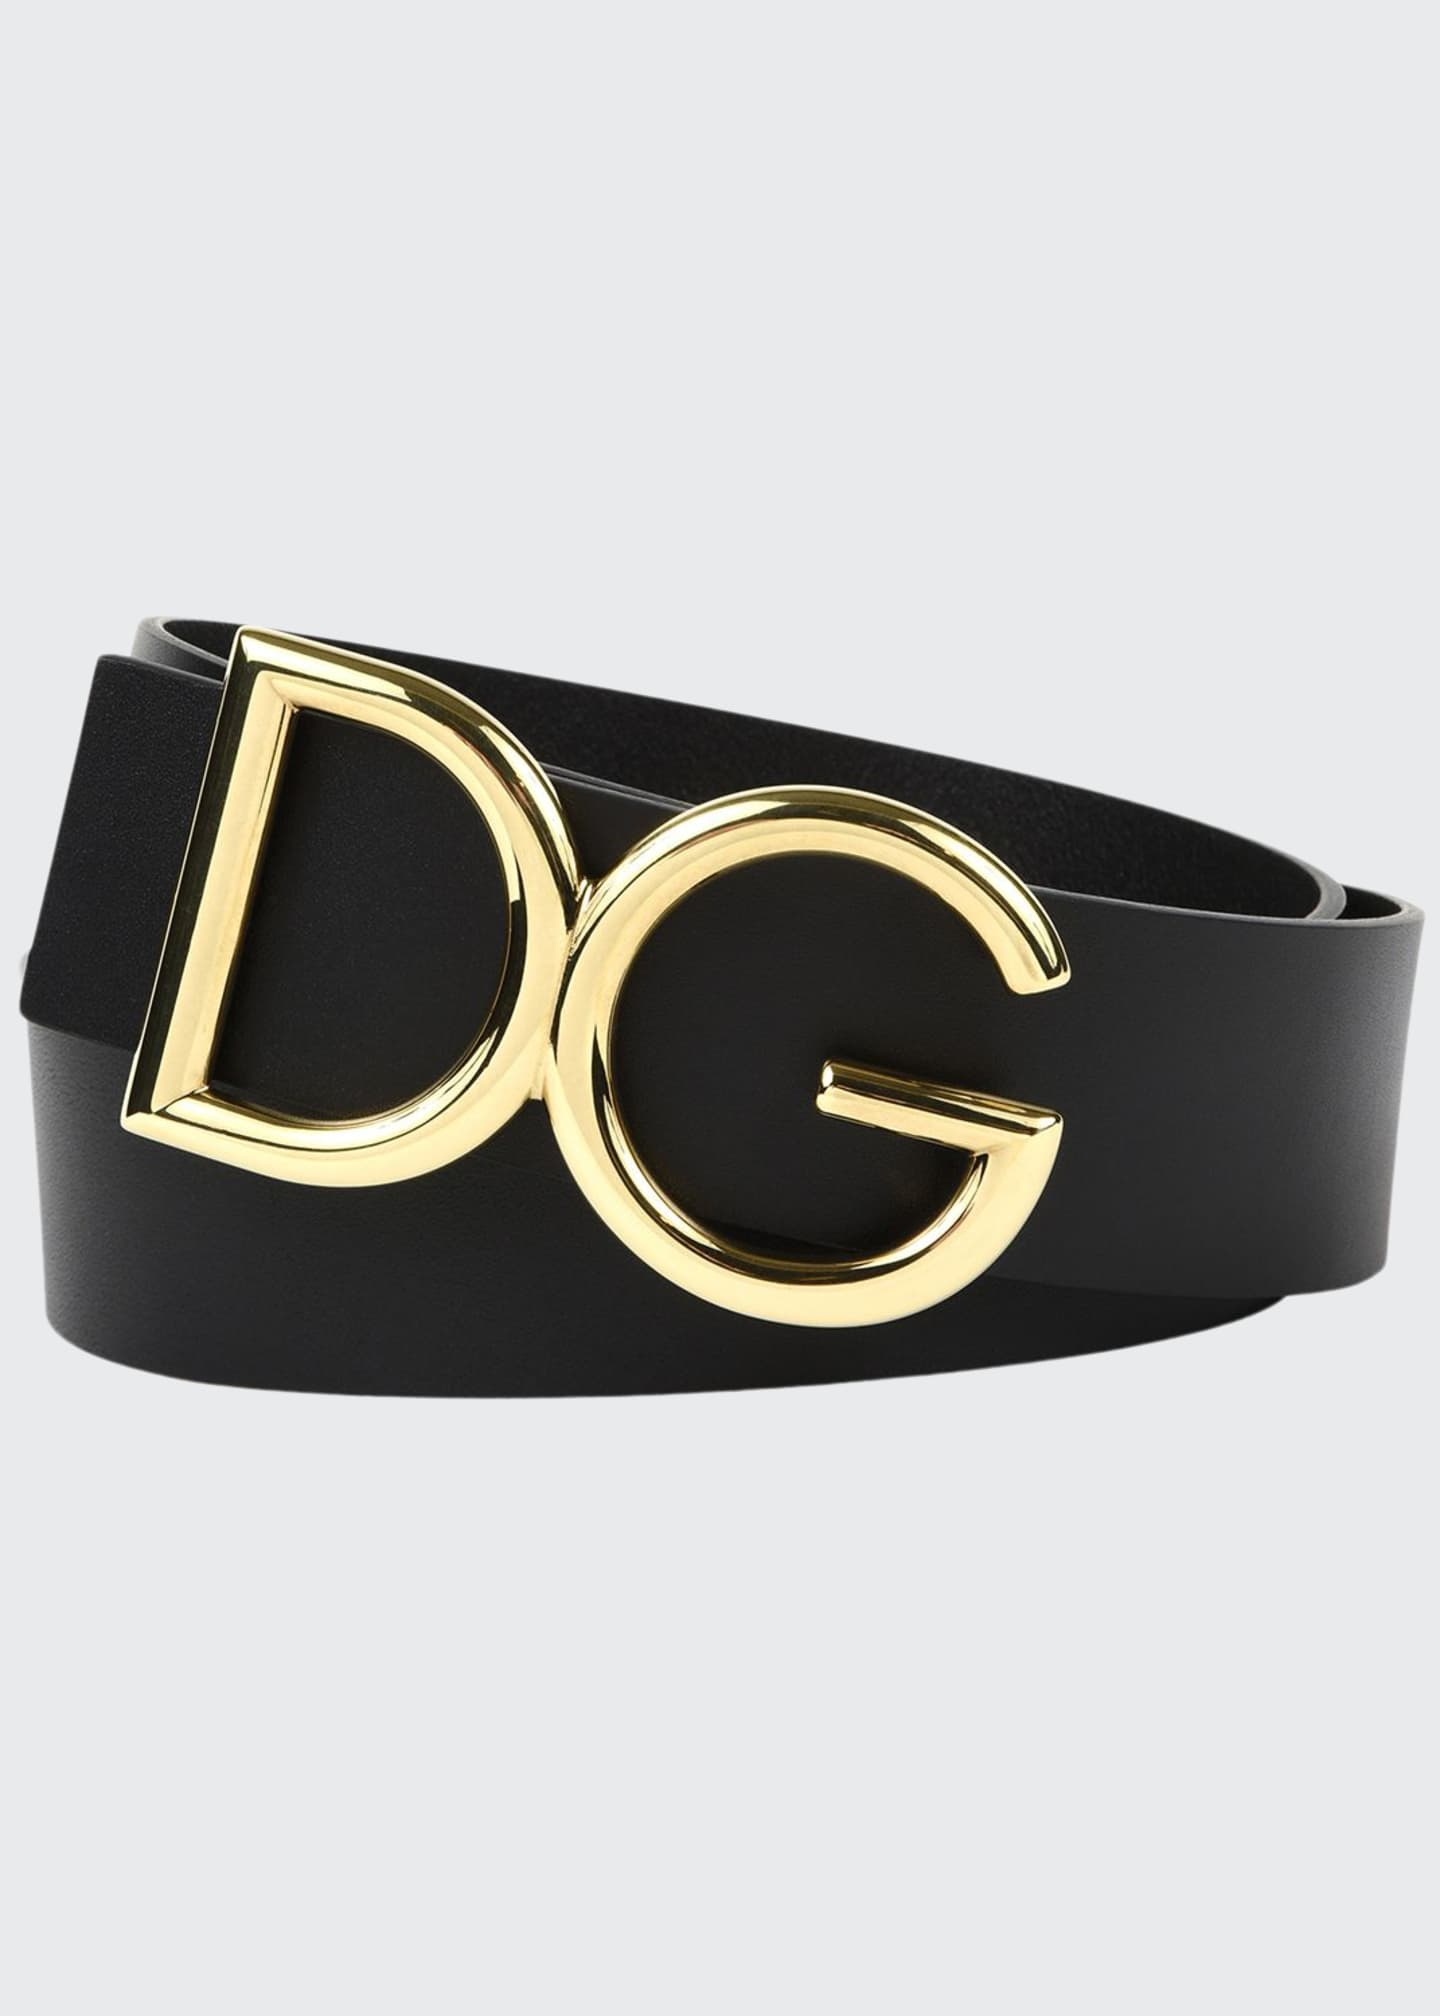 Dolce & Gabbana Men's Leather Belt w/ Logo